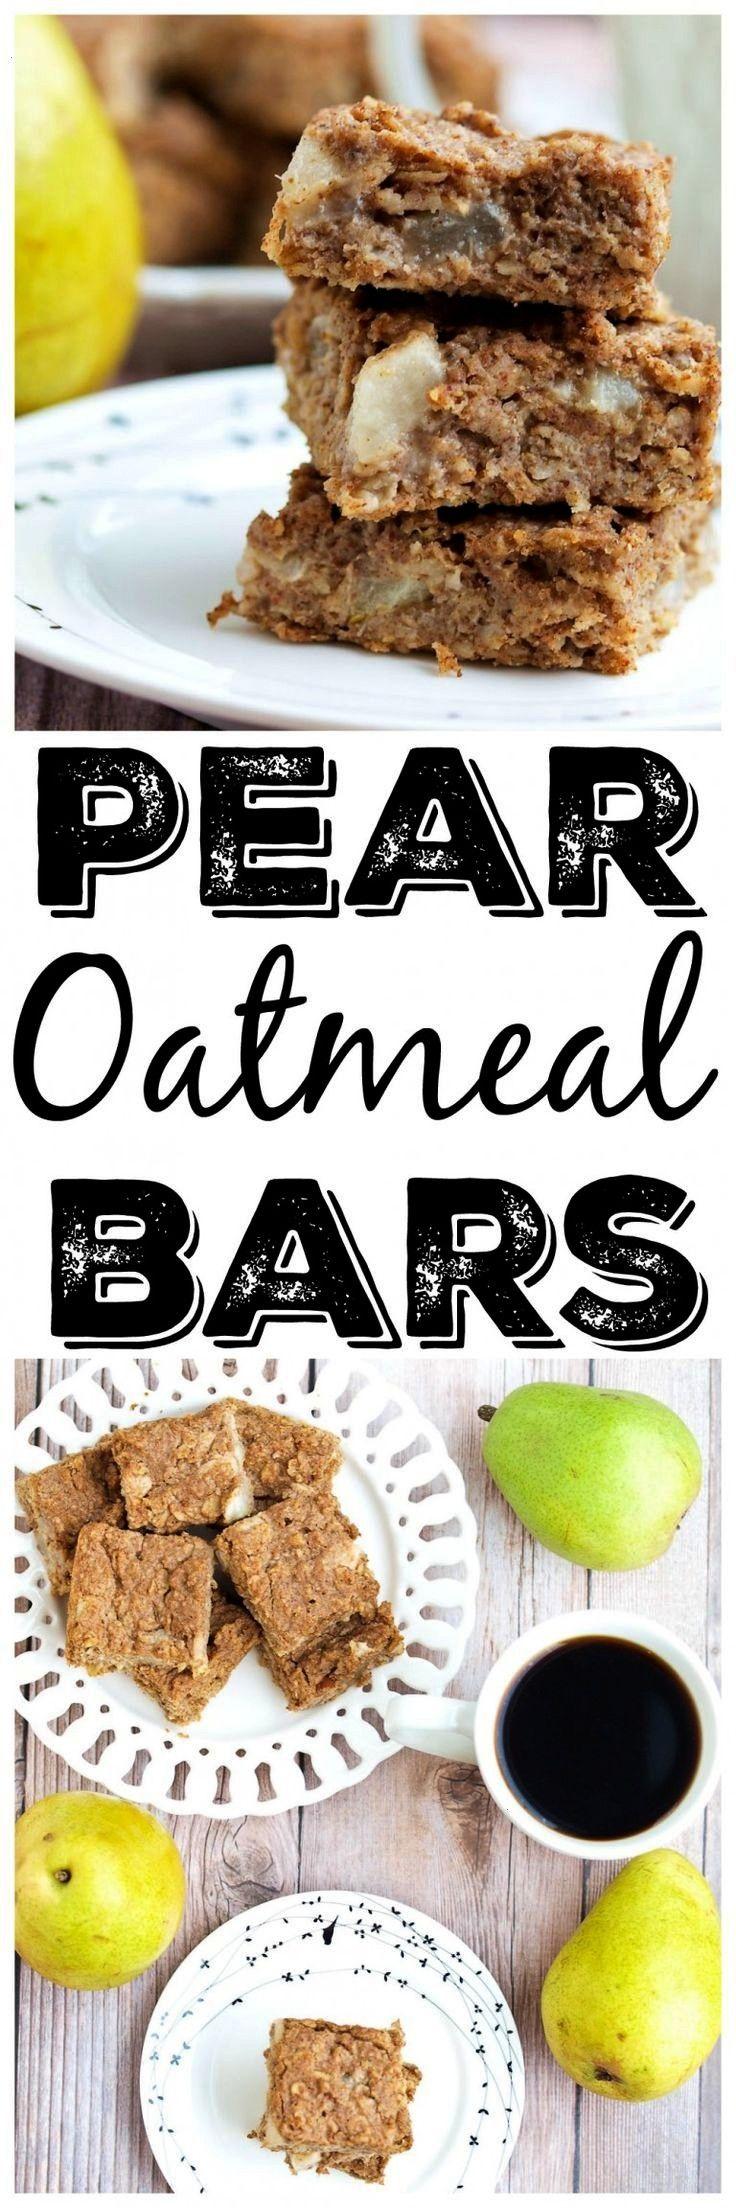 + GF Pear Oatmeal Bars Pear Oatmeal Bars, Vegan, Gluten Free, and No added sugar in these babies! T